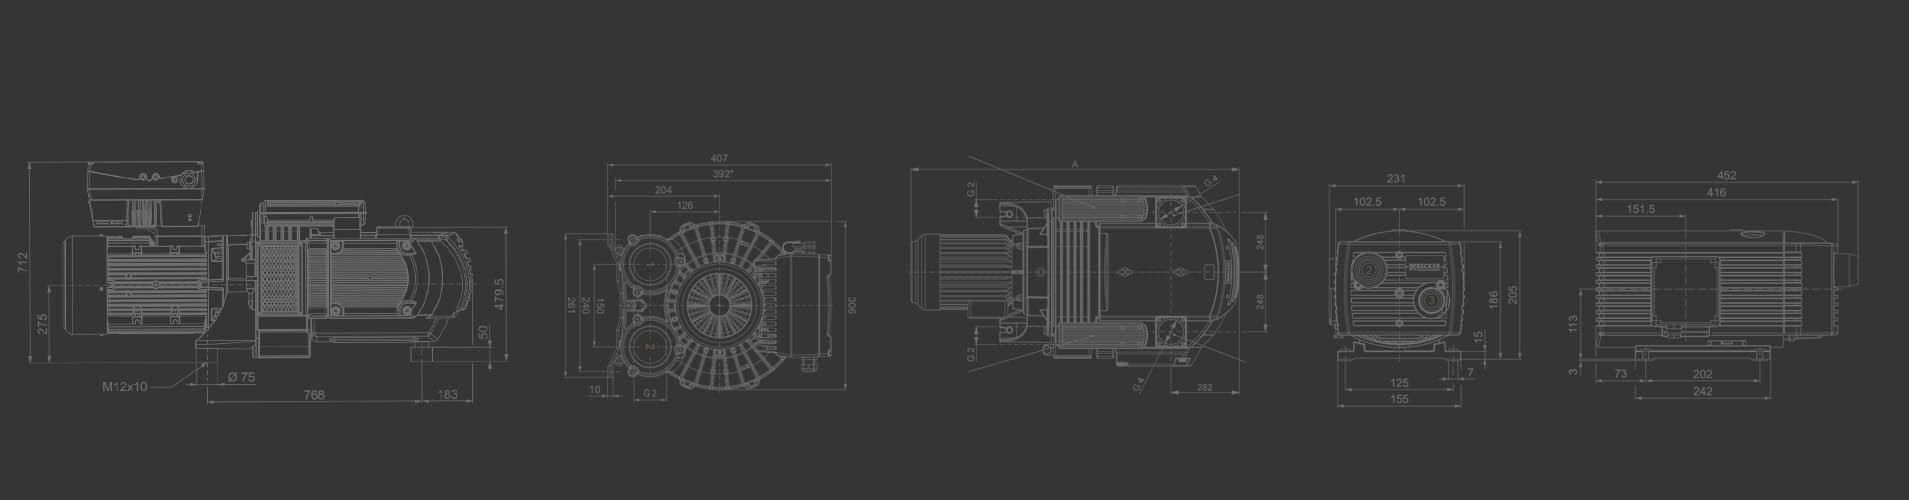 Mazda 3 Service Manual: InputTurbine Speed Sensor RemovalInstallation FS5 A EL